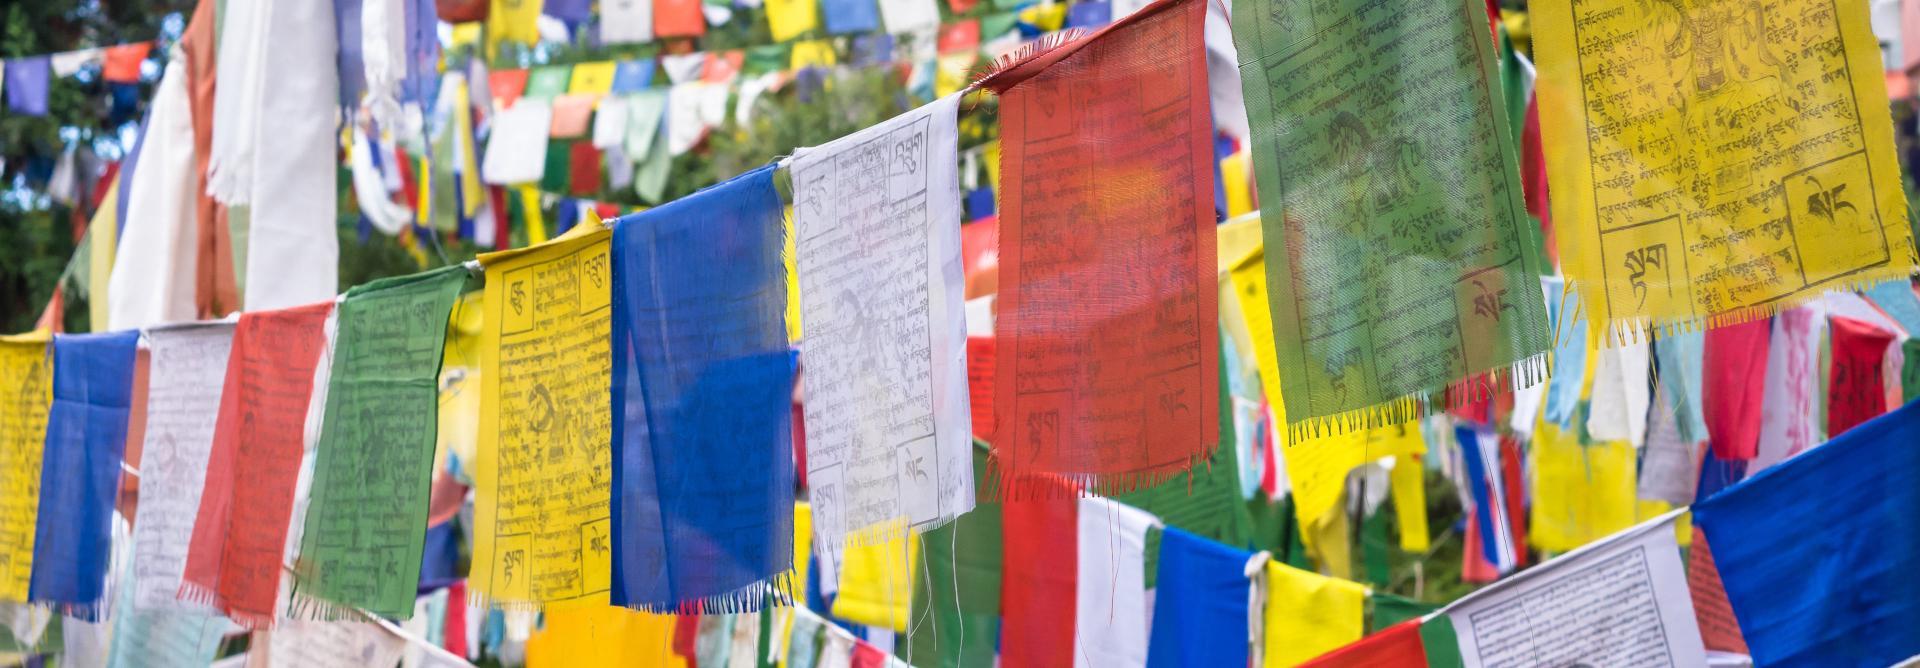 Himalayan Dalai Lama - Space